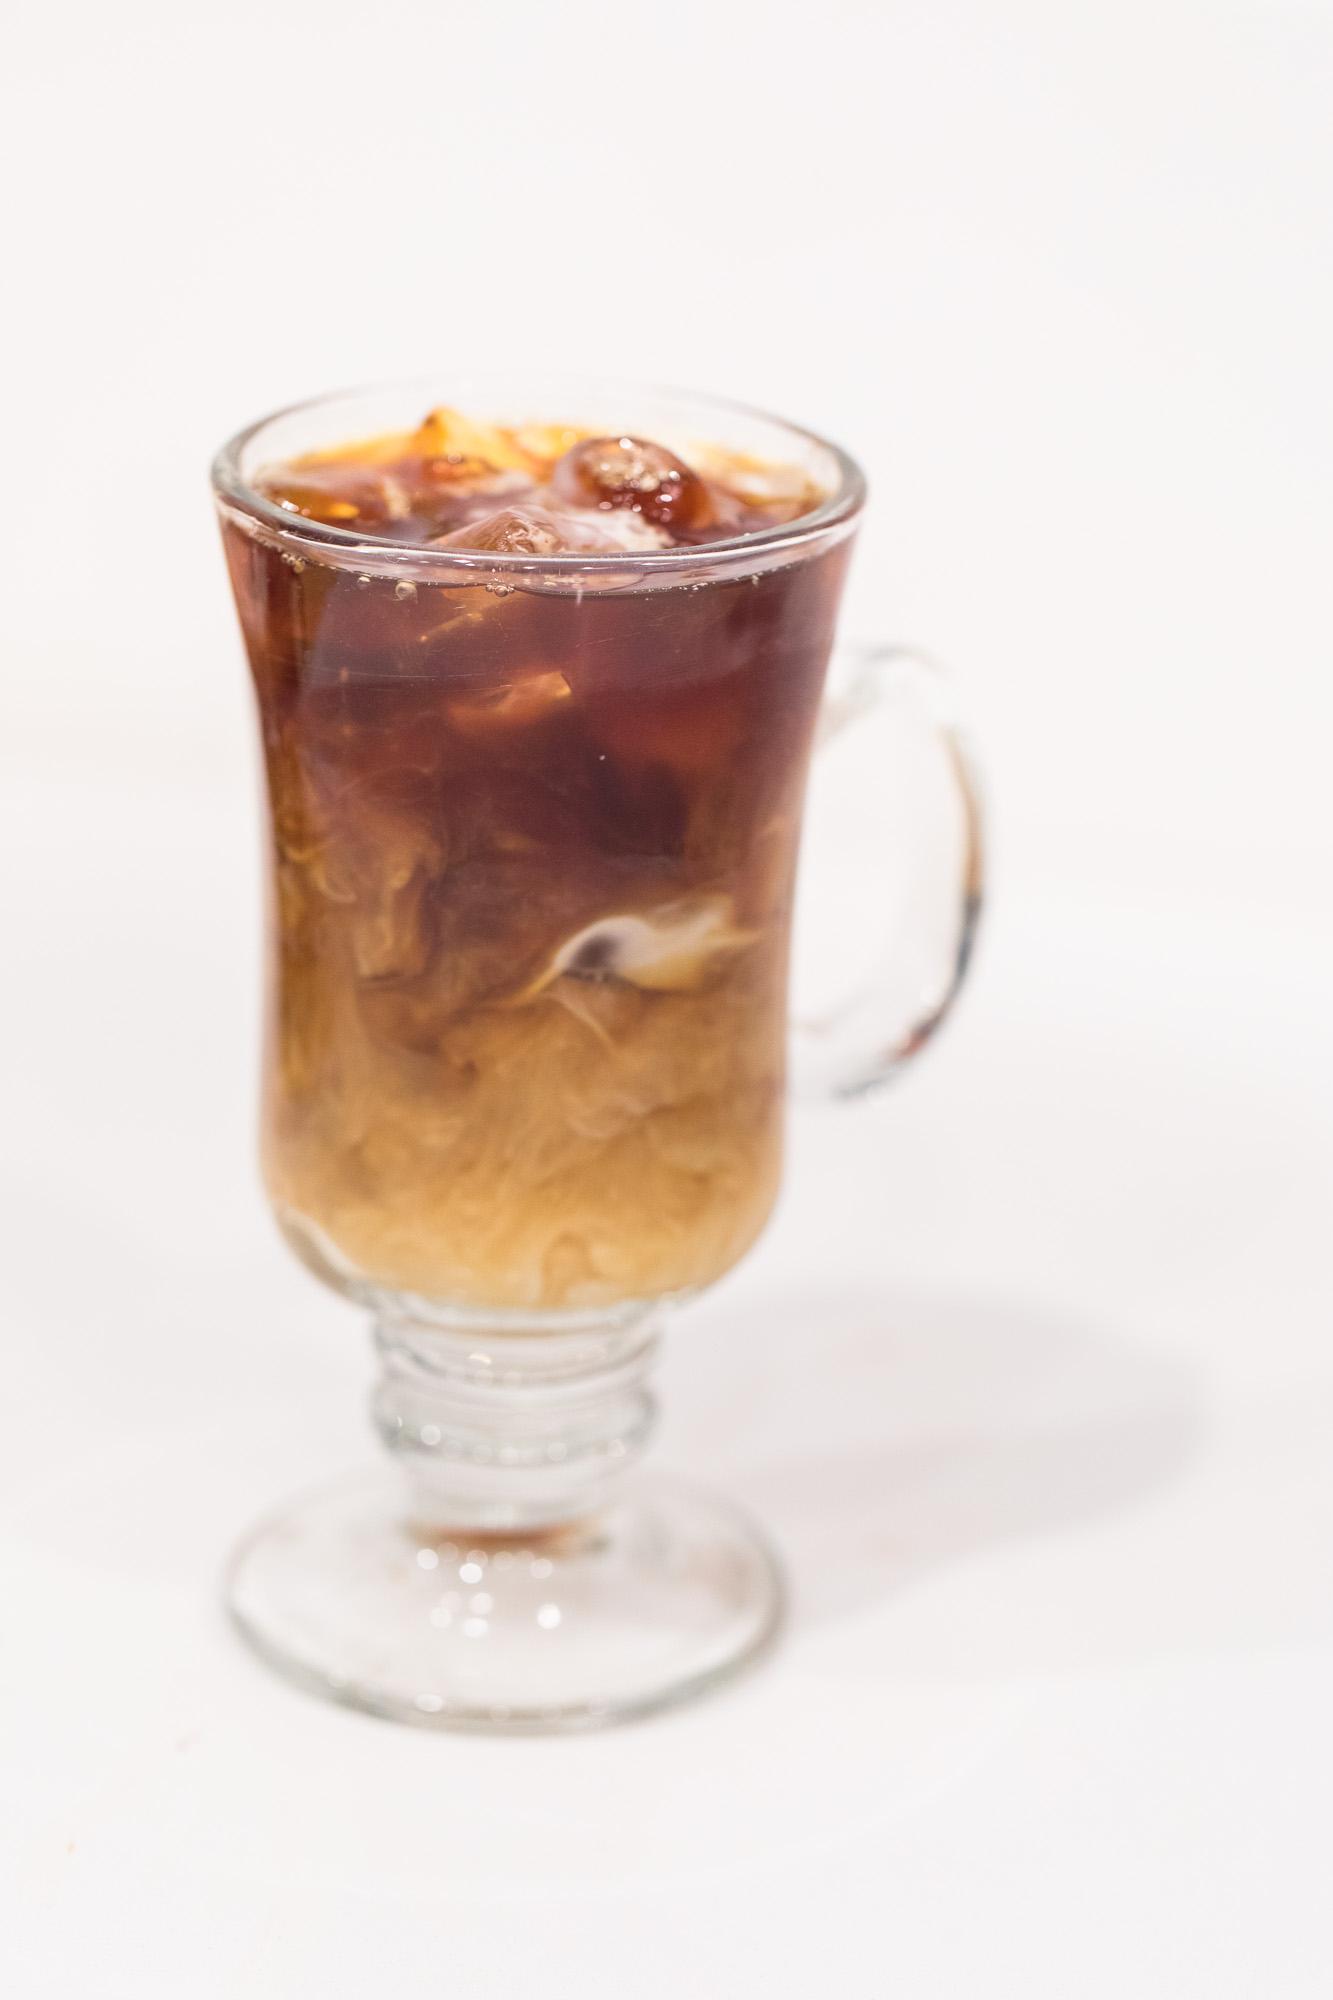 Maka-vegan-gluten-free-maui-cafe-coffee-1.jpg